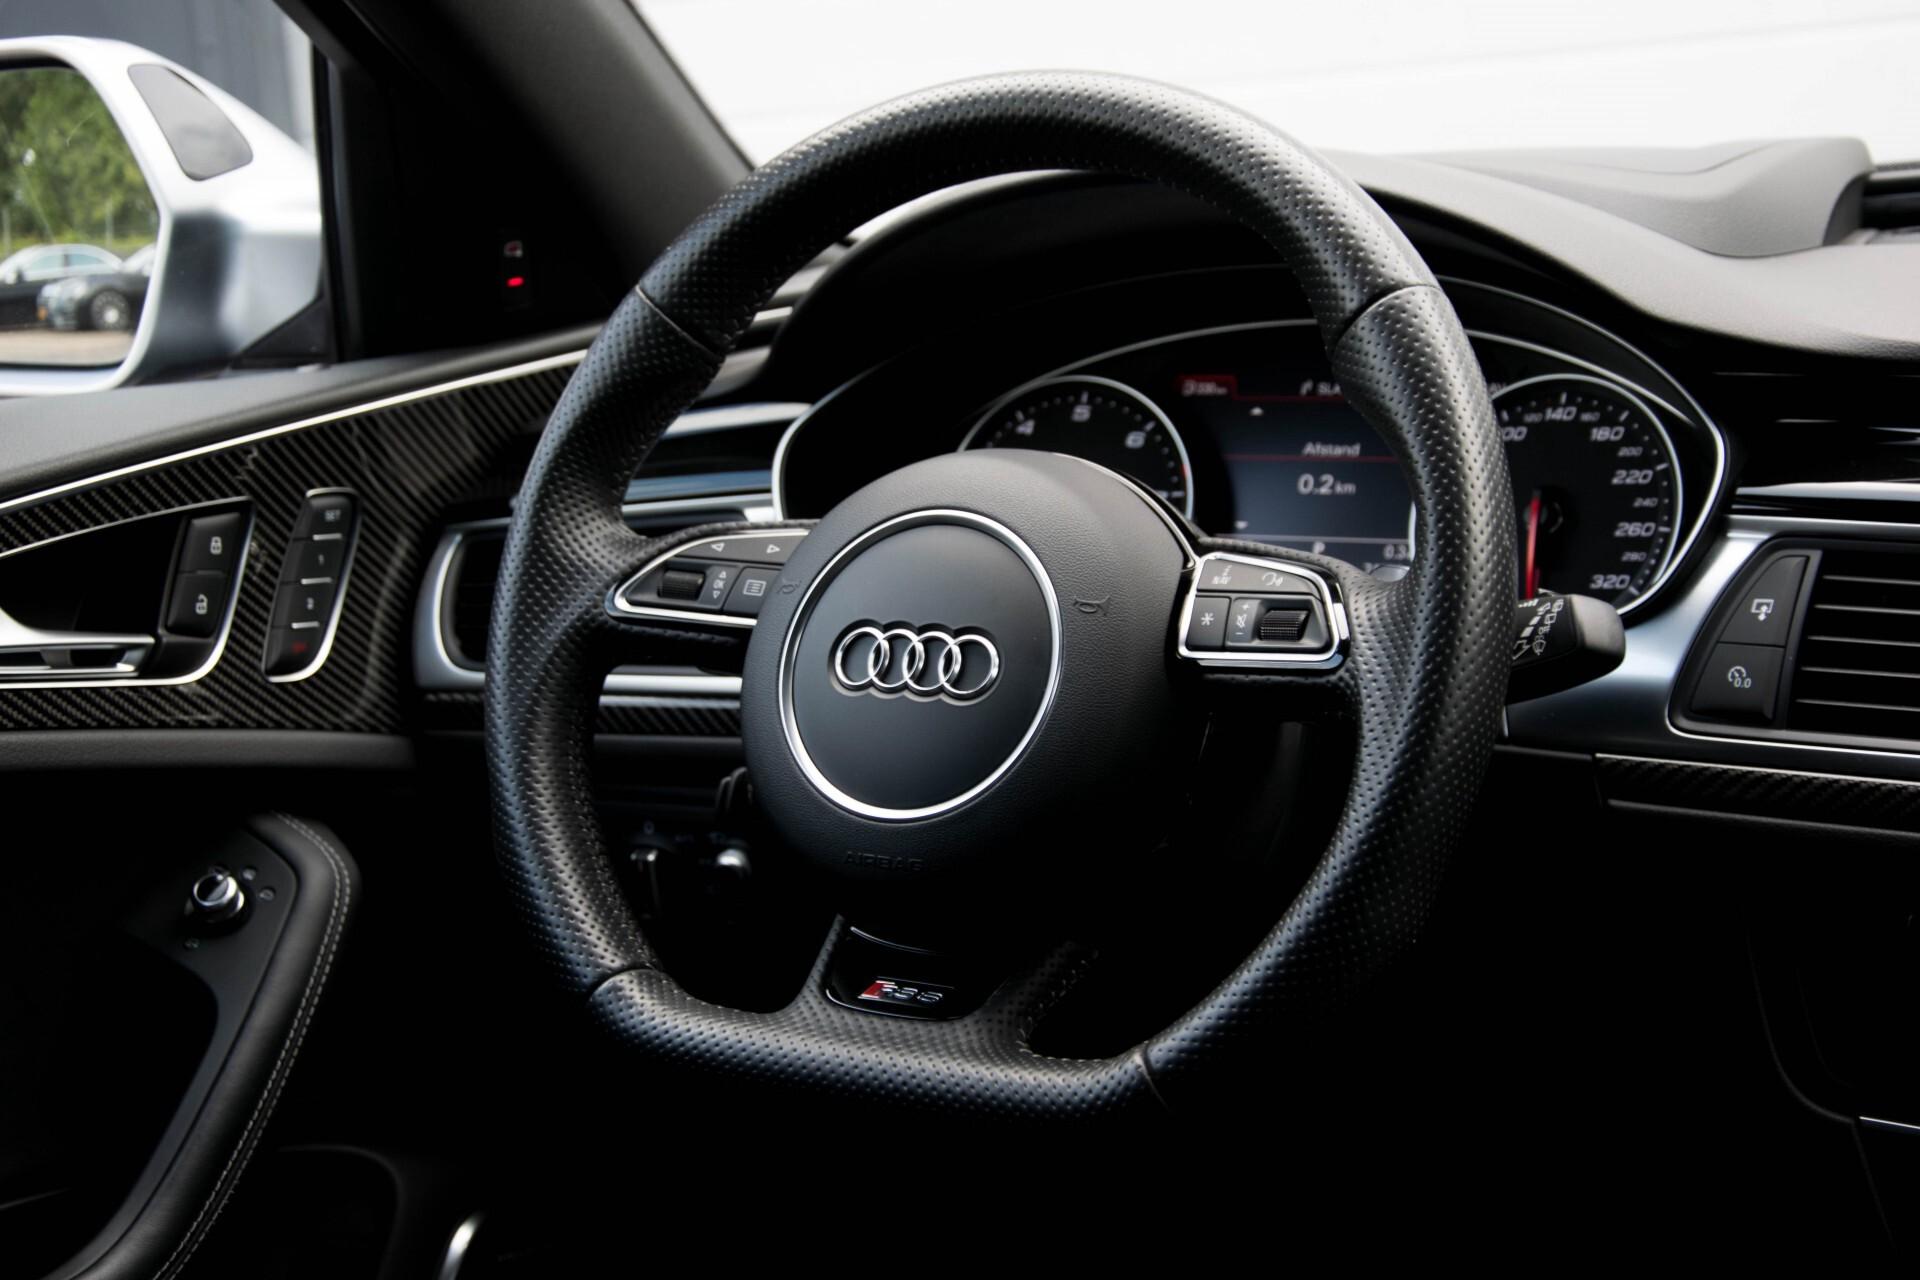 Audi RS6 Avant 4.0 TFSI Quattro B&O/Carbon/Head-Up/Nachtzicht/Exclusive/Camera/Keyless/Pano Aut8 Foto 9